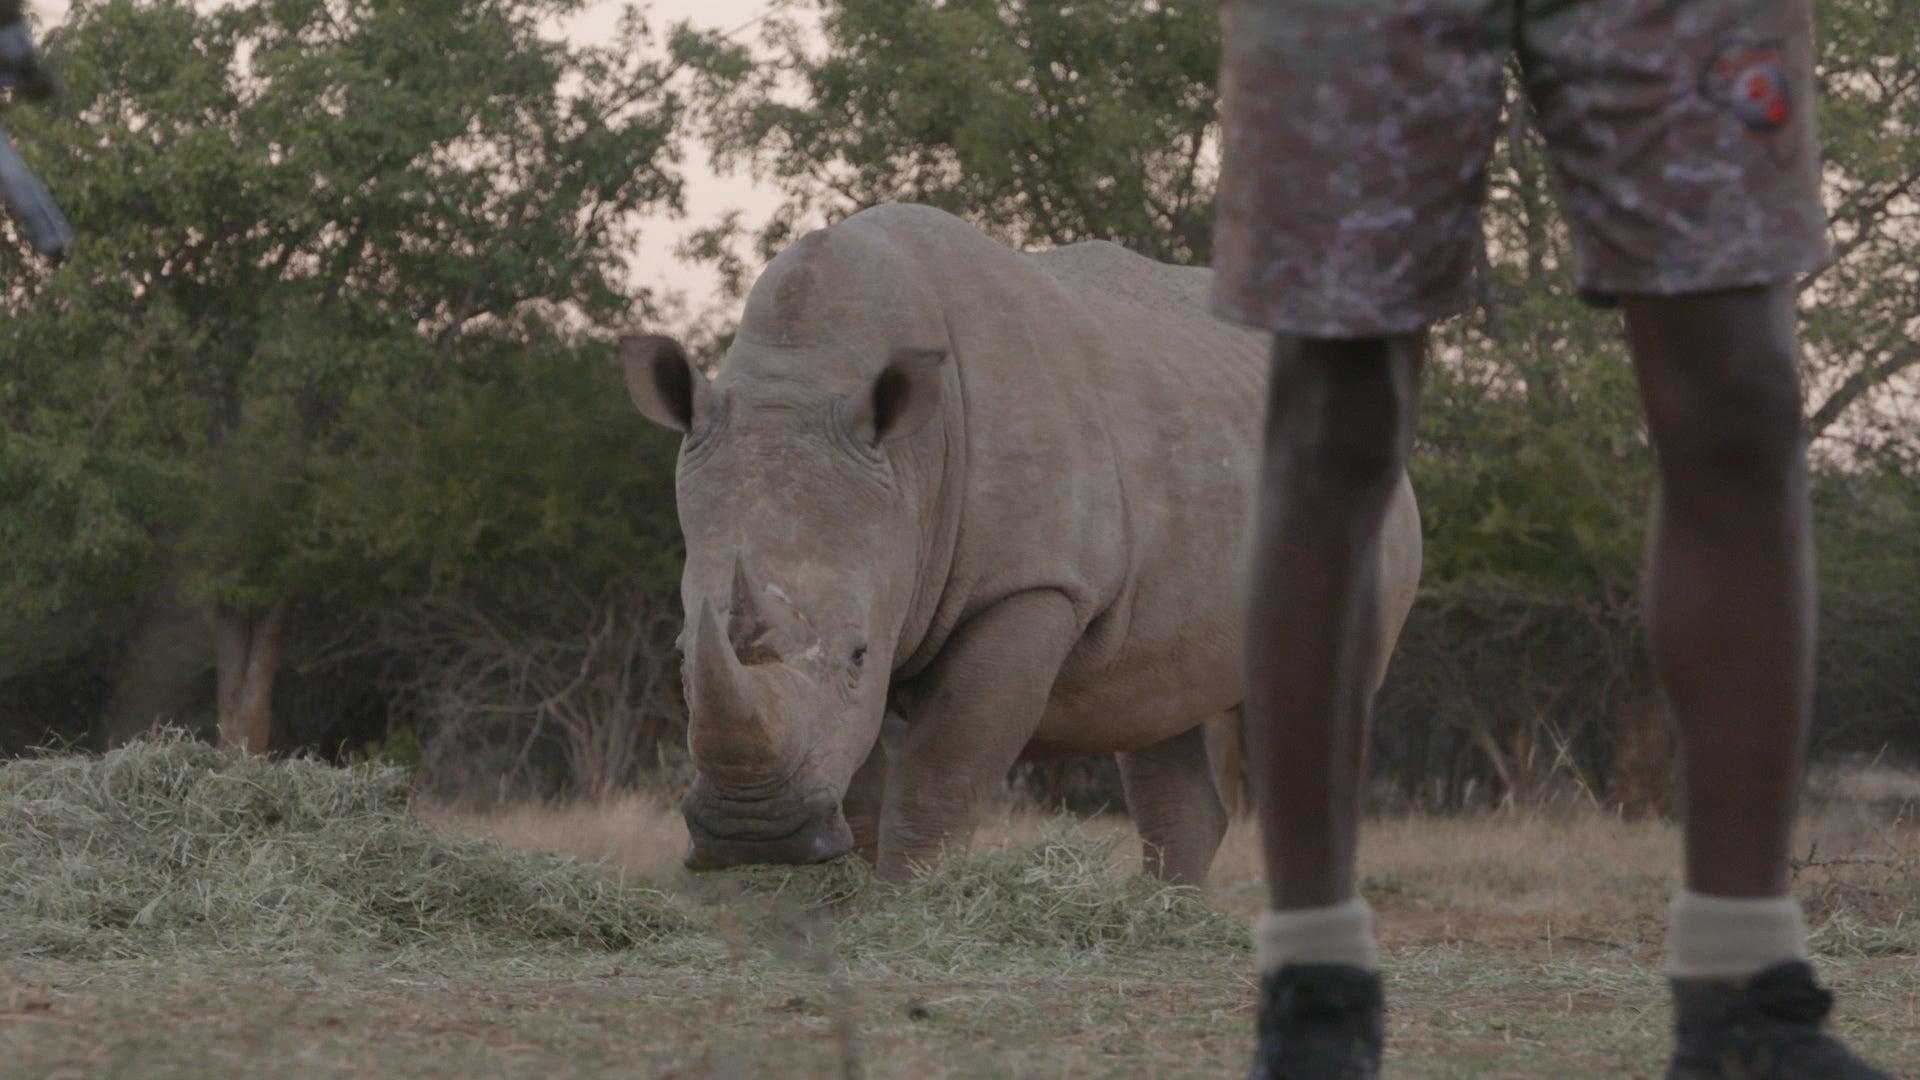 DNA Helps Nab Rhino Poachers